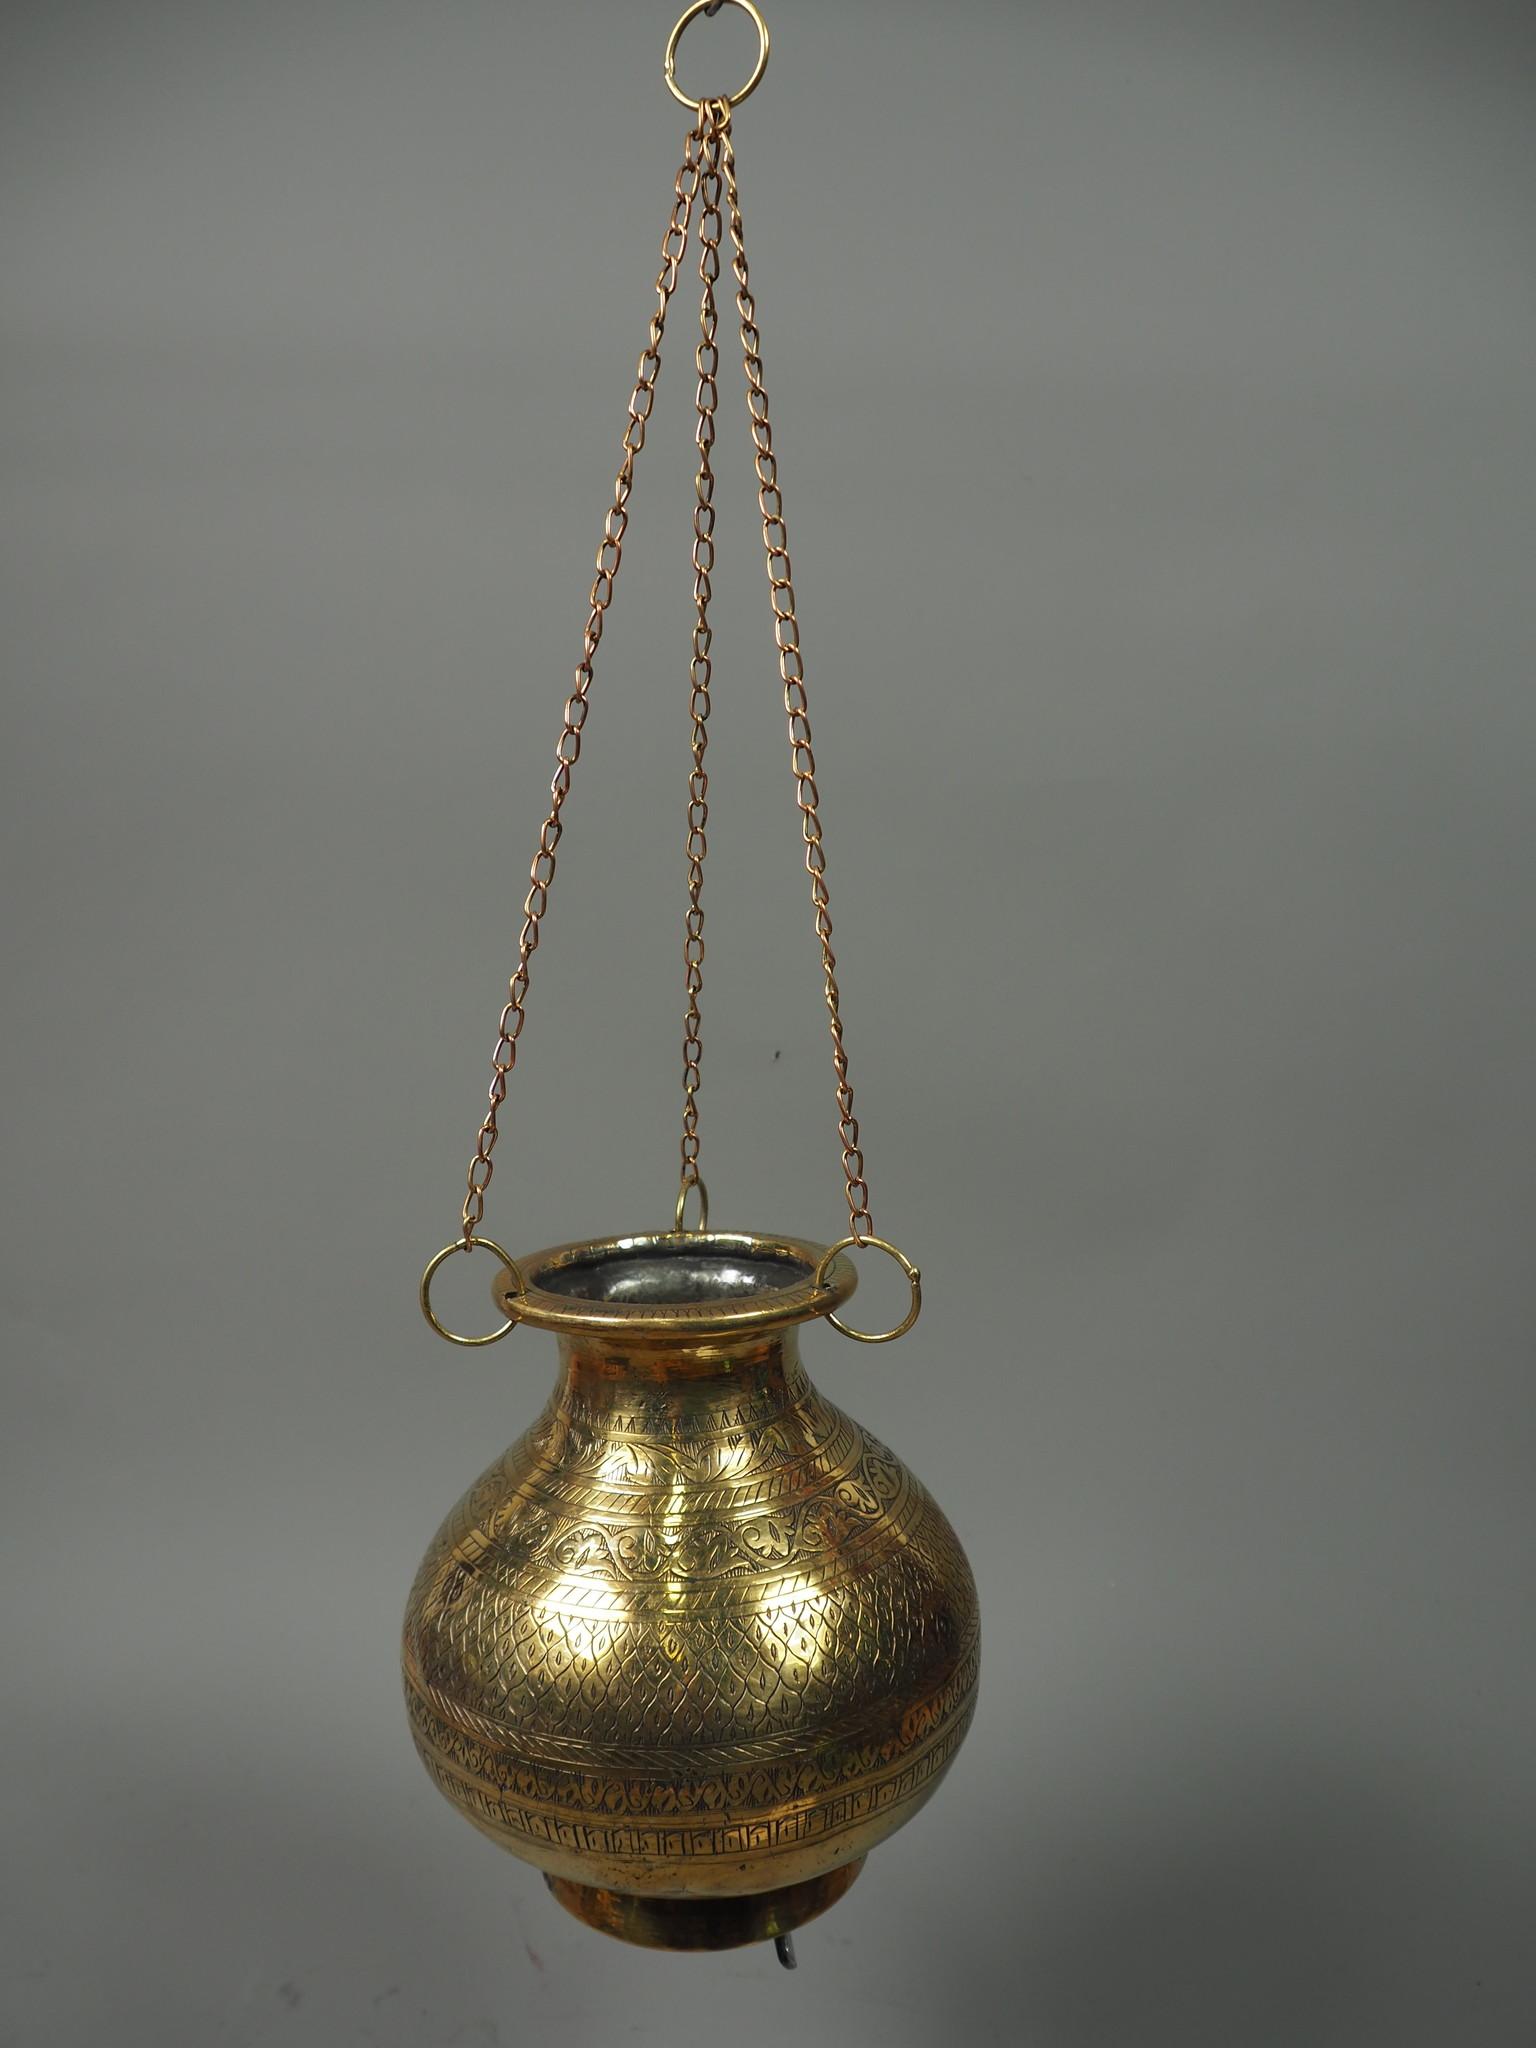 antique solid copper orient Ayurvedic Shirodhara Panchakarma oil therapy Yoga Dhara vessel Patra india -No:  21/14 - Copy - Copy